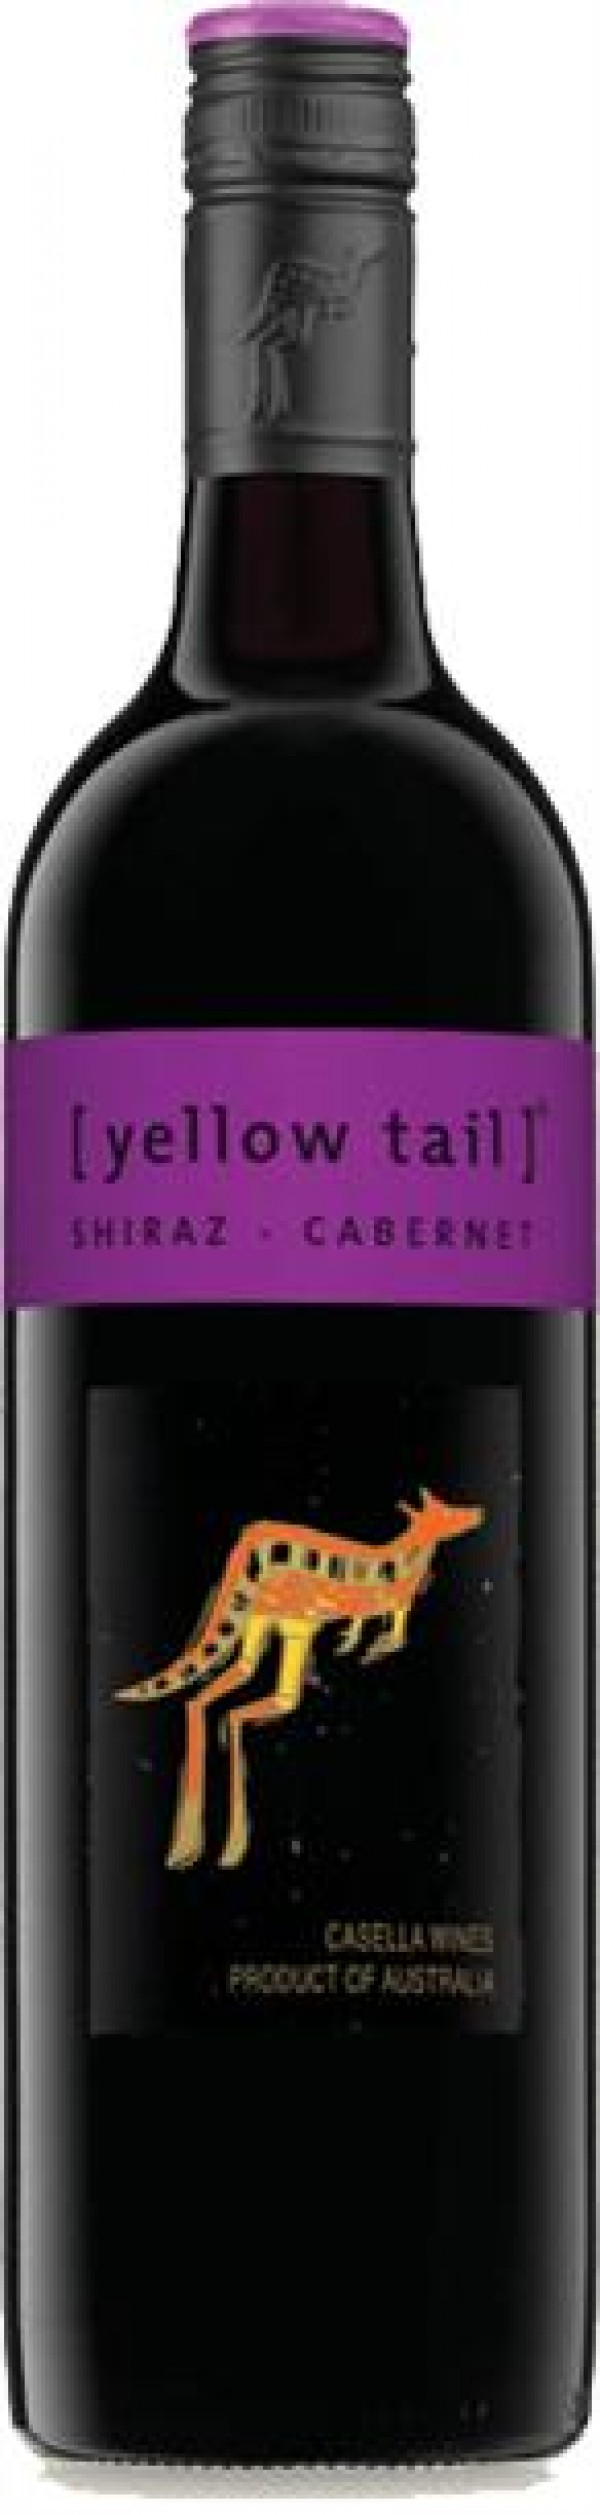 Yellow Tail Shiraz - Cabernet